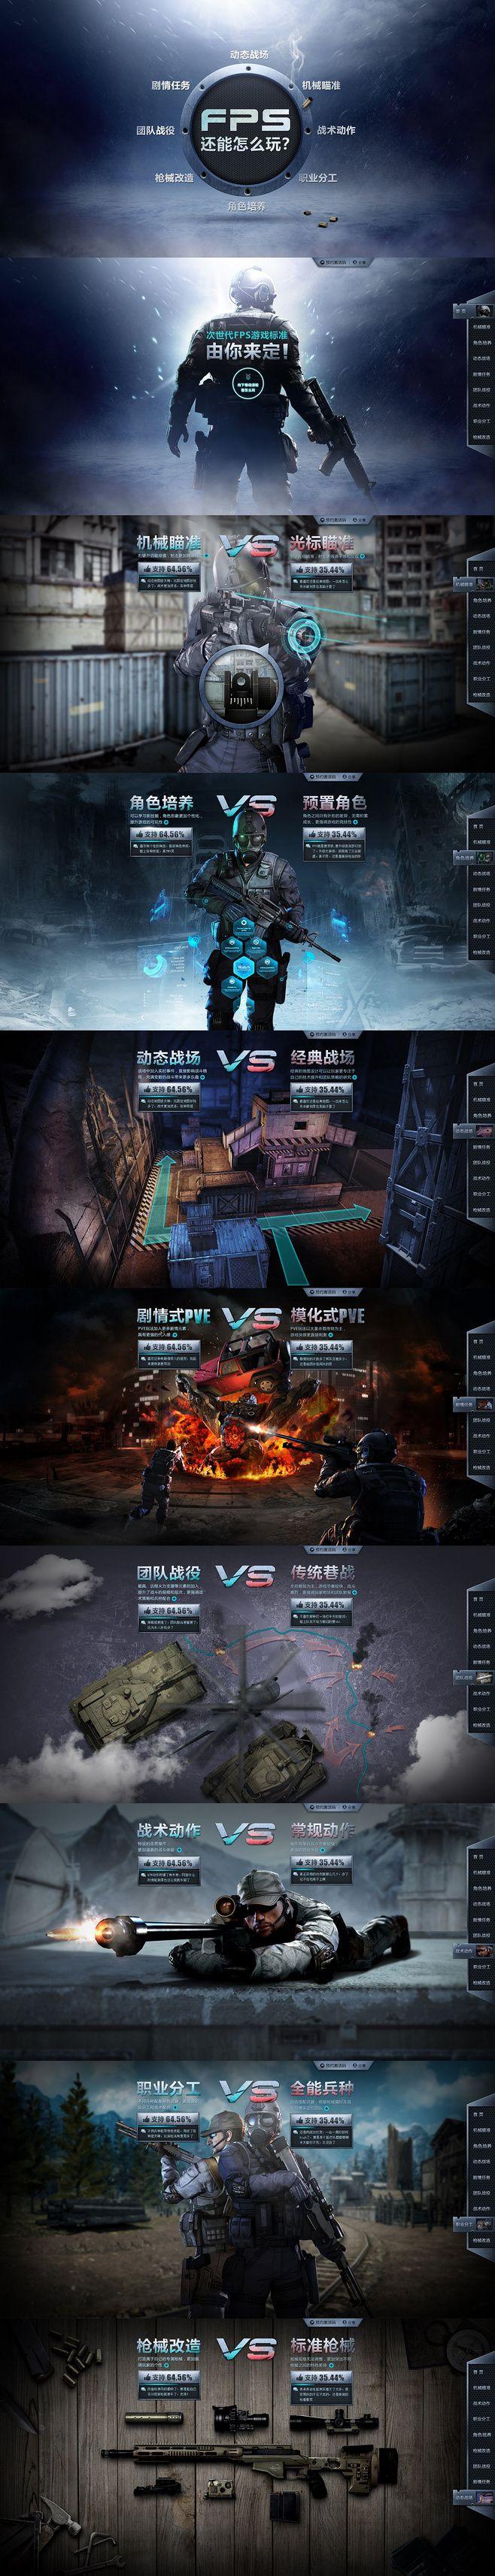 FPS类游戏专题设计 | 盒子UI